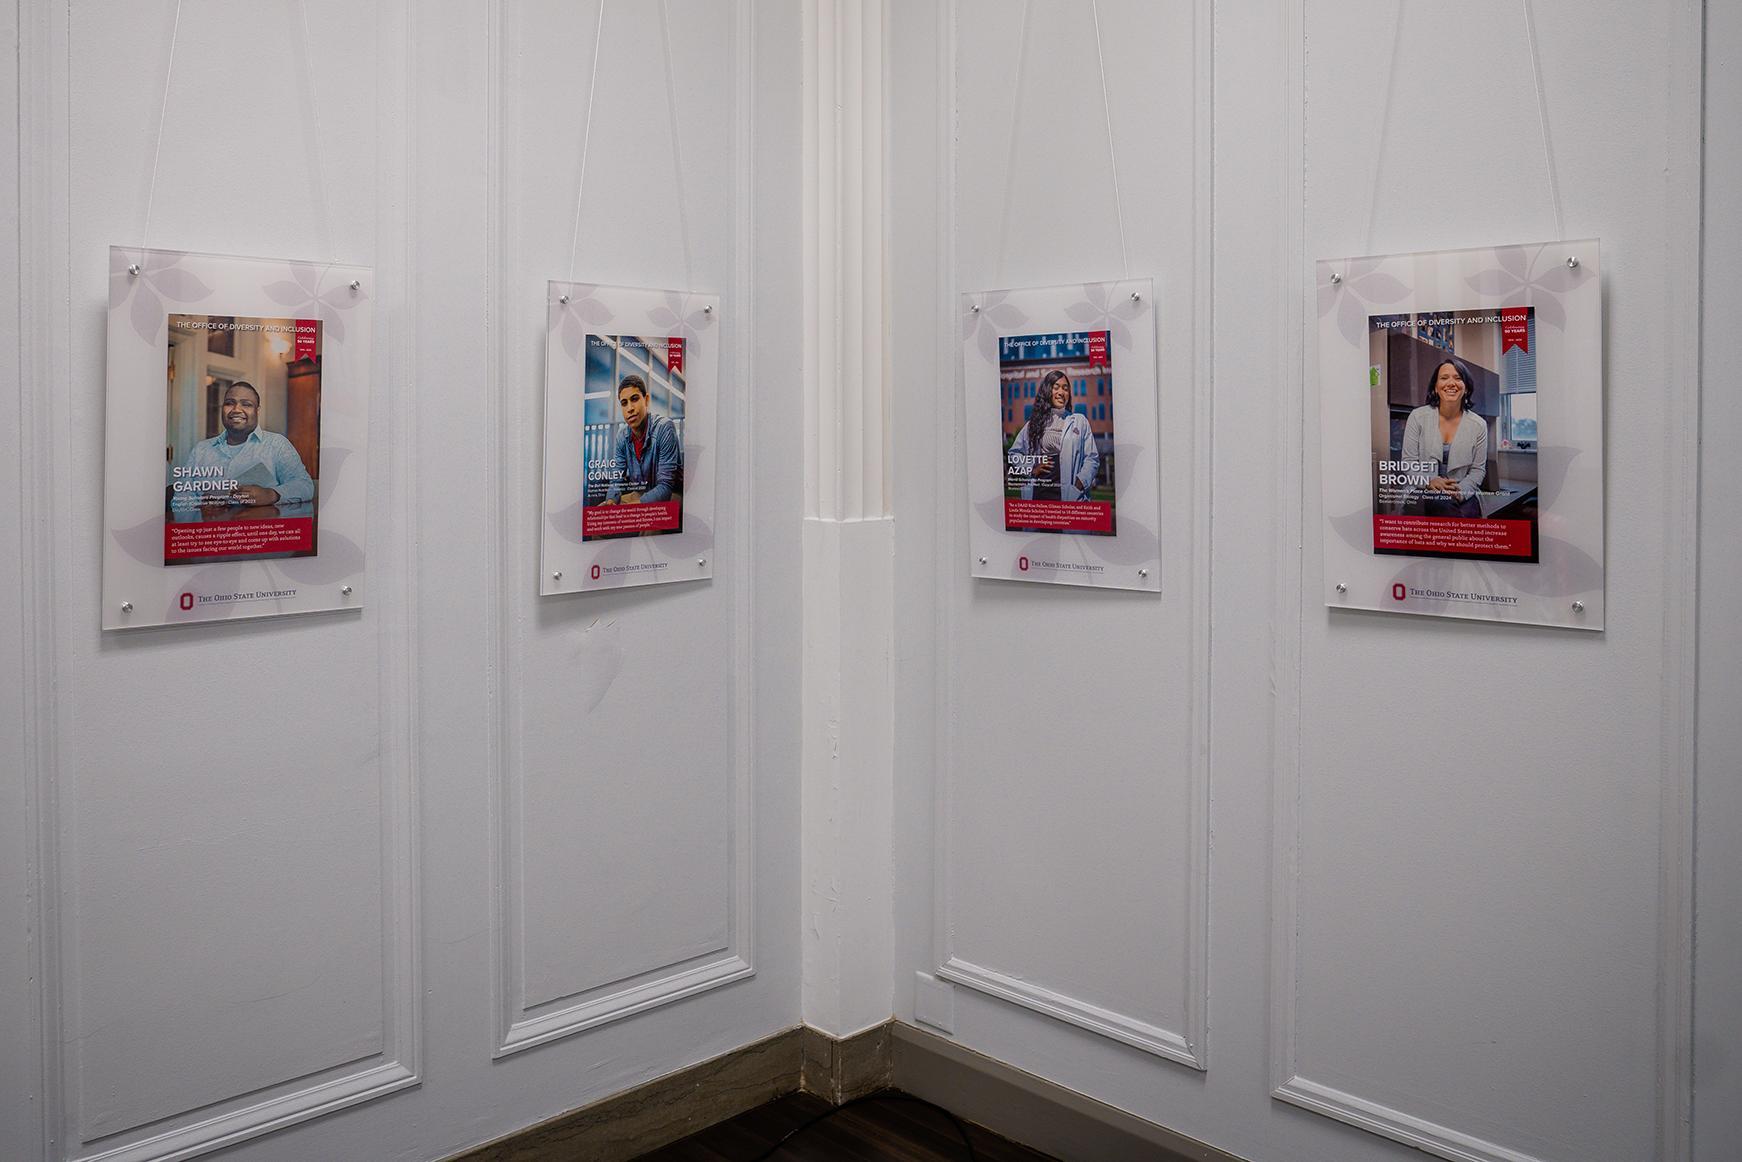 Frames with ODI Scholar photos